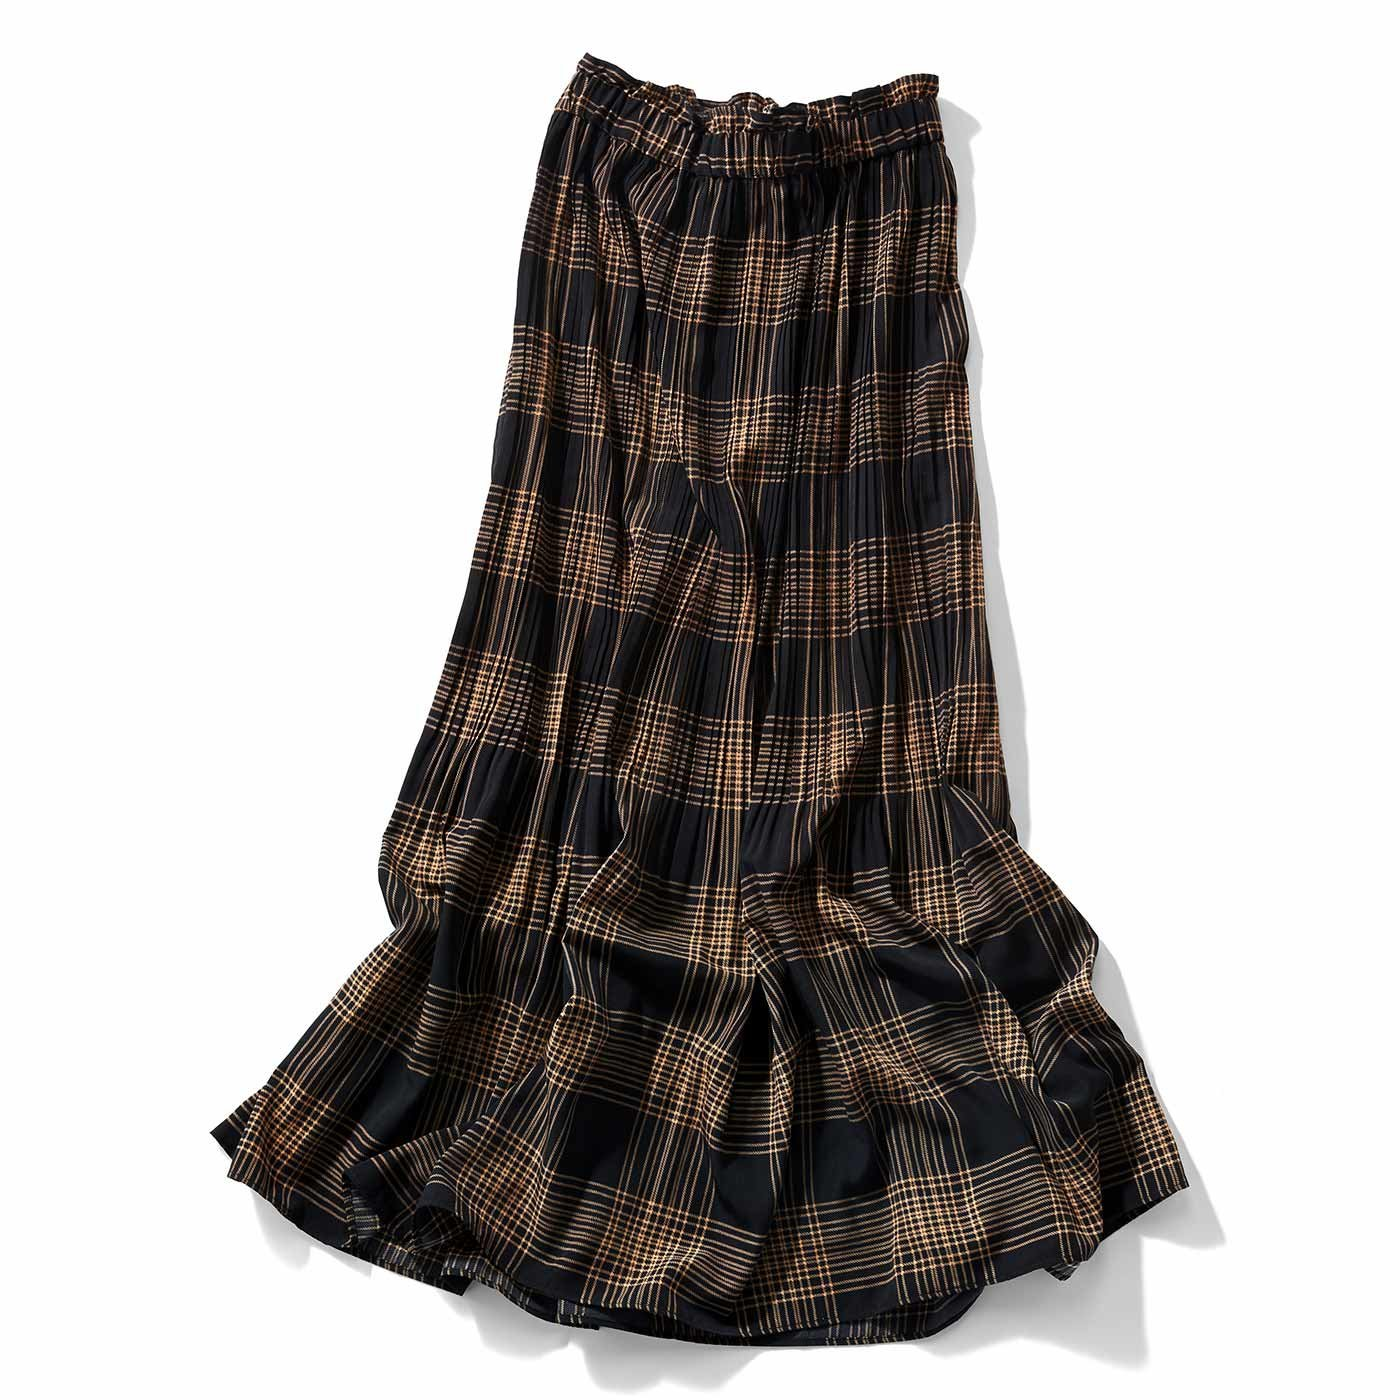 IEDIT[イディット] 消しプリーツのチェック柄マキシスカート〈ブラック〉